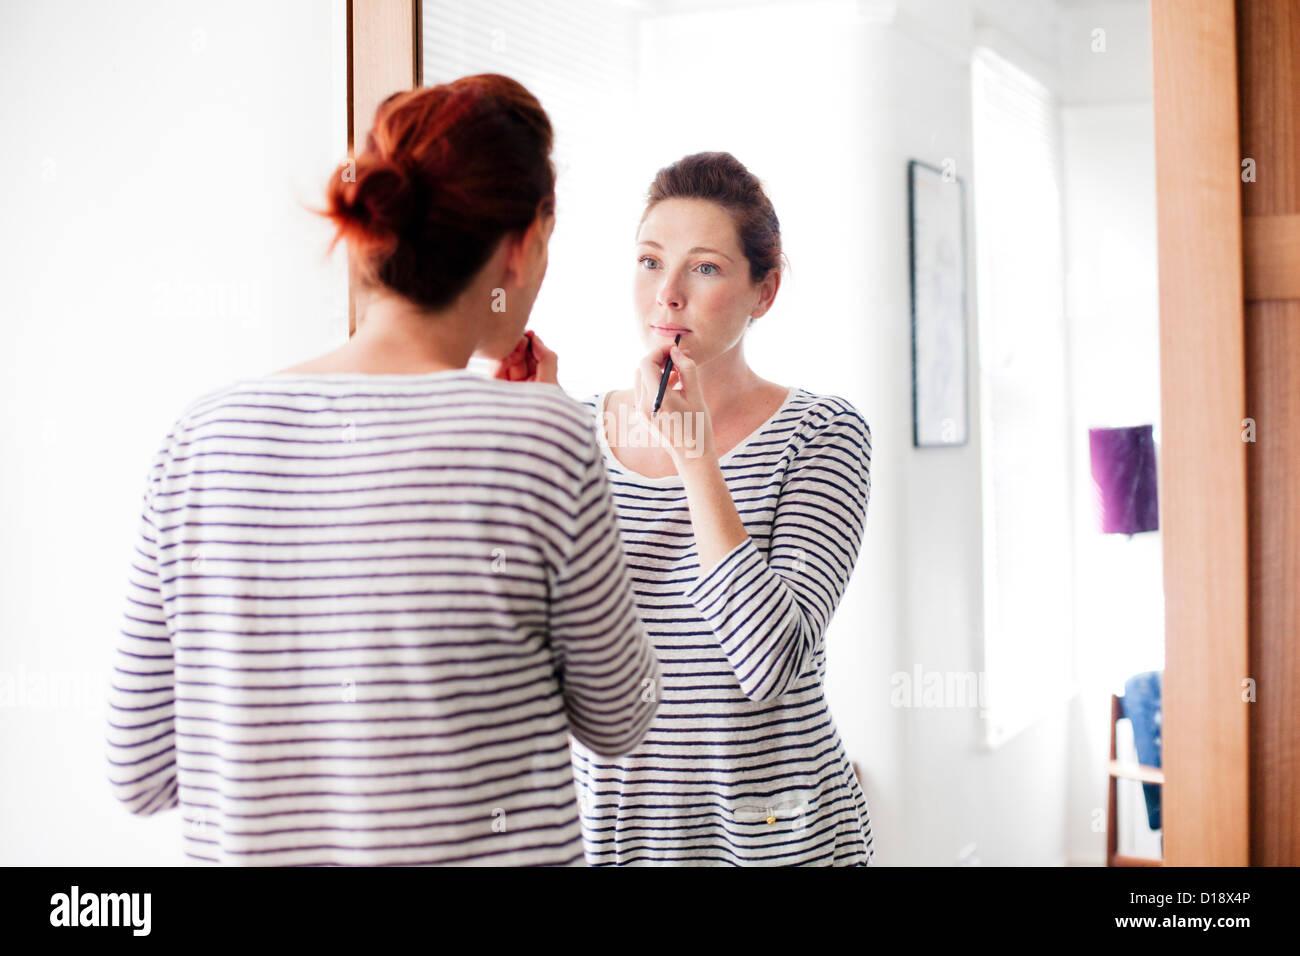 Woman applying make up Stock Photo